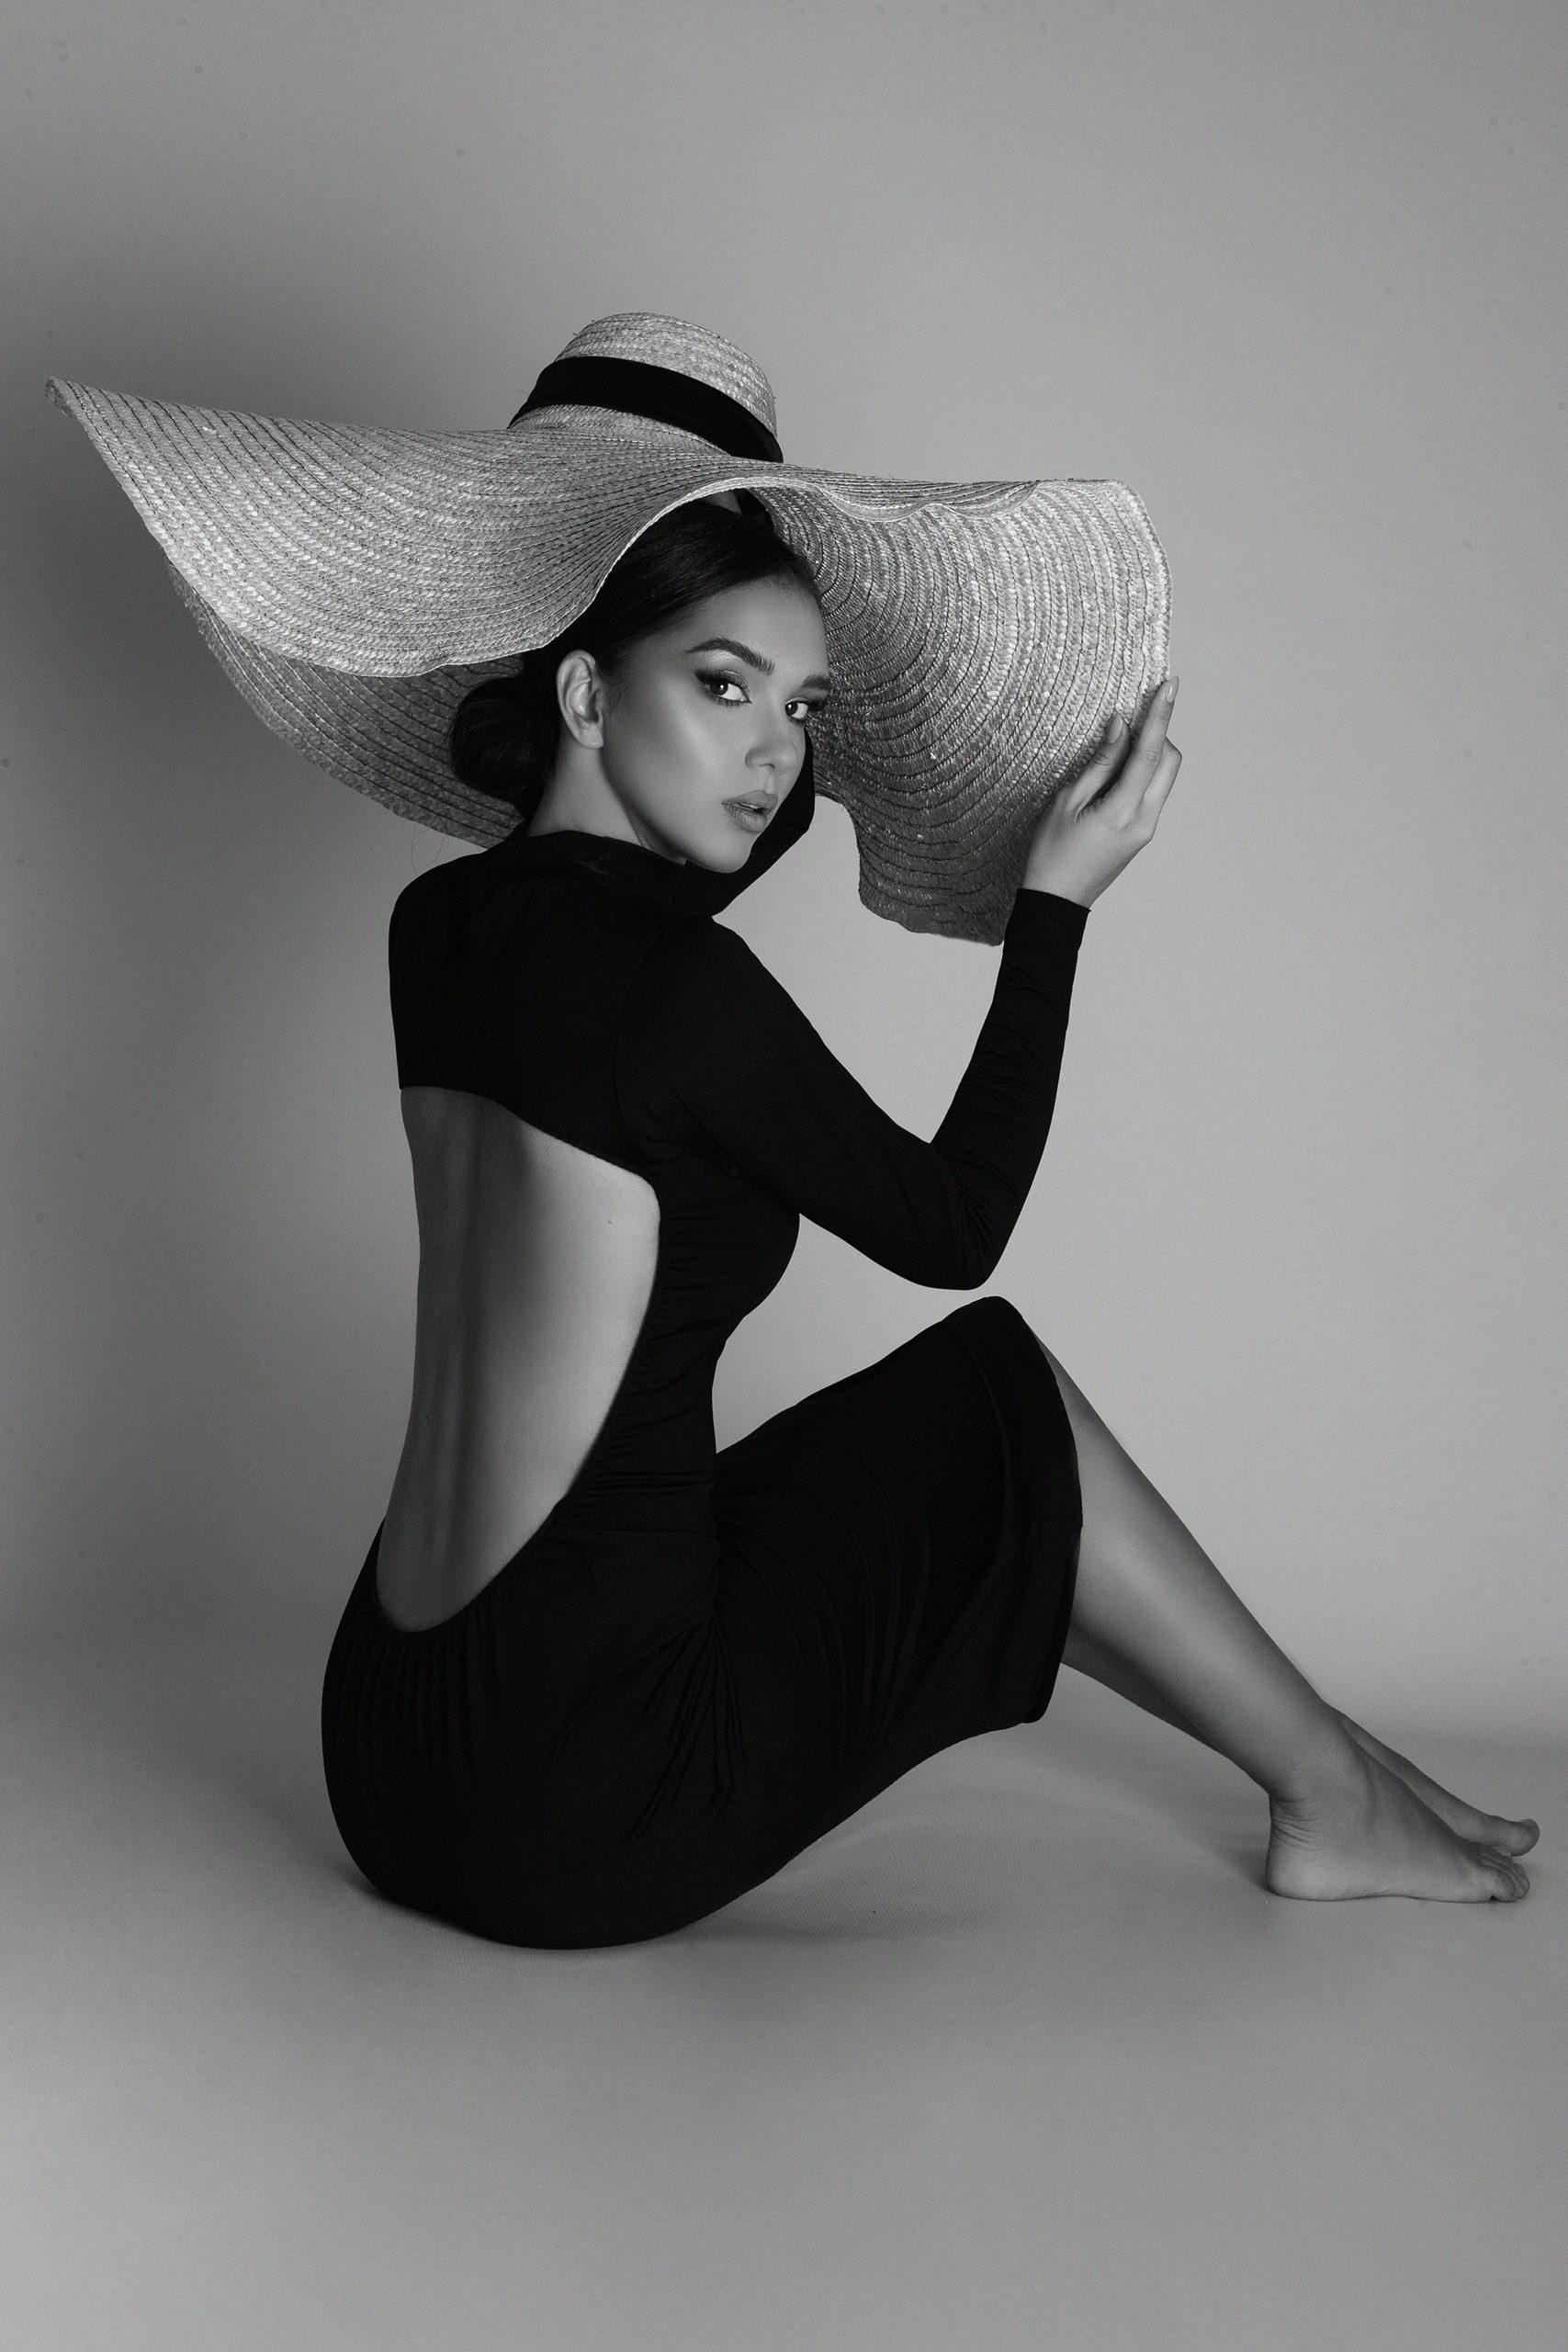 Classy black dress by Jungle Humans